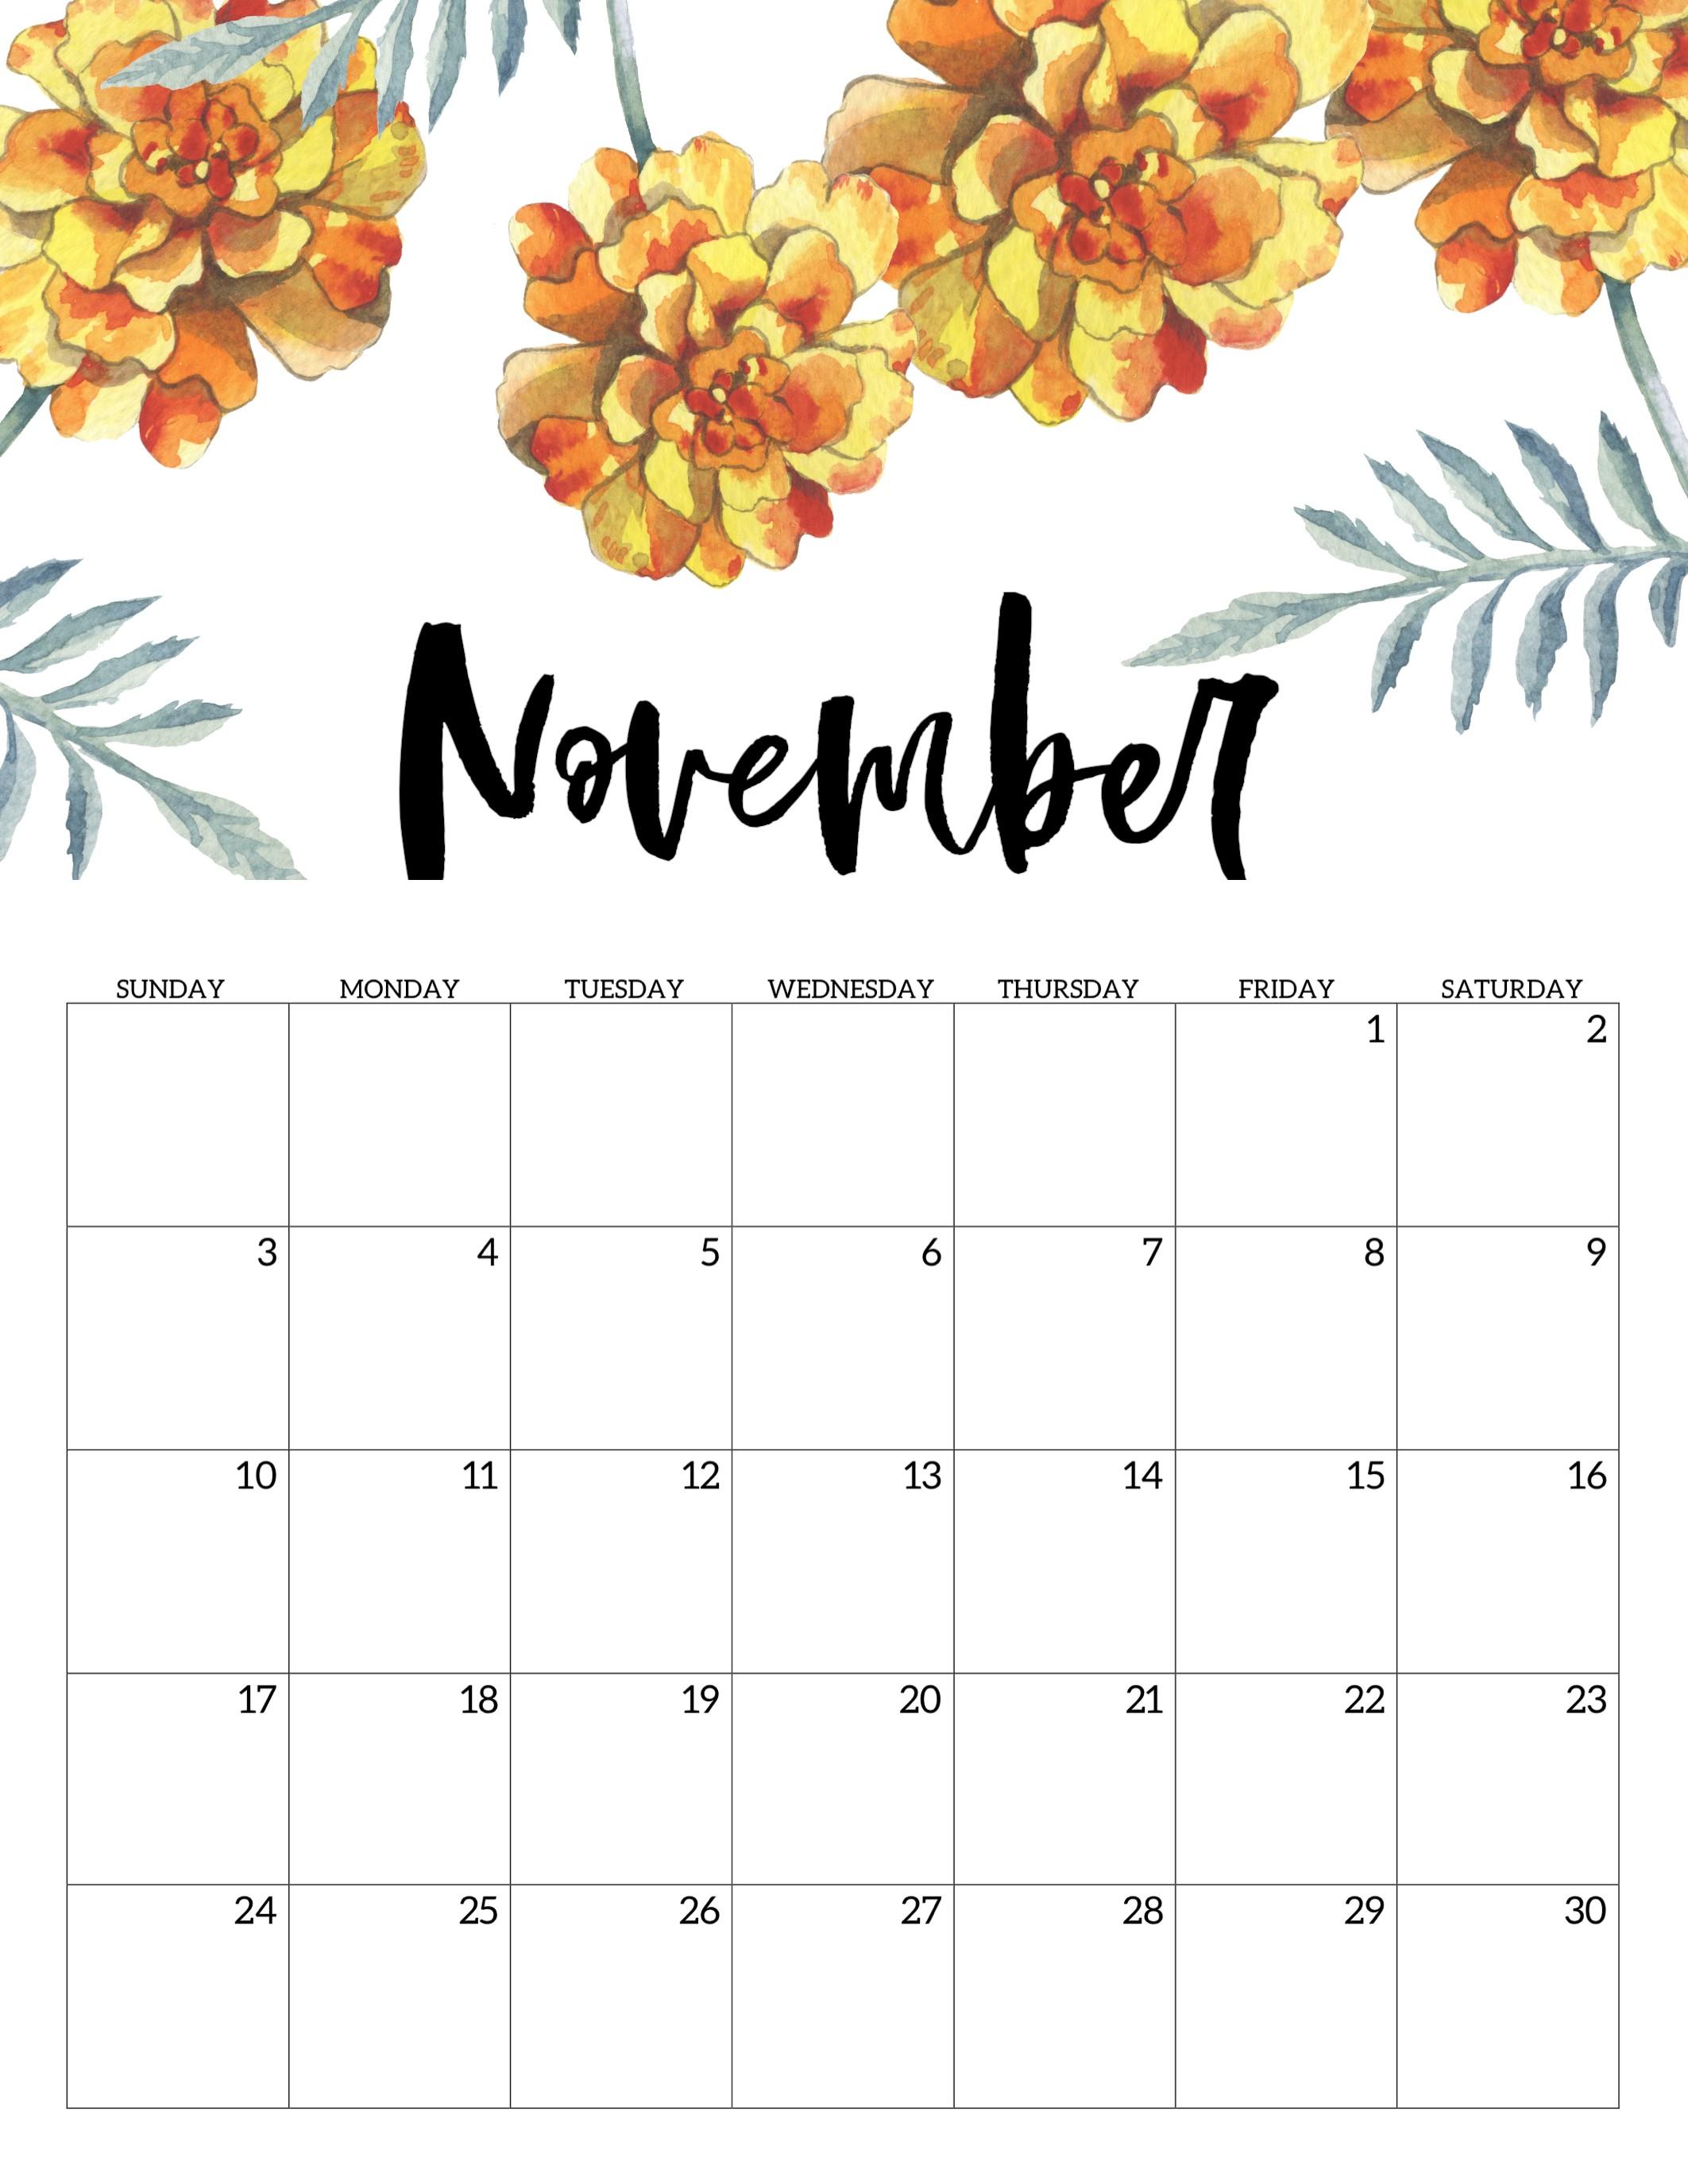 November Calendar 2019 Printable Free Printable Calendar 2019 Floral Paper Trail Design